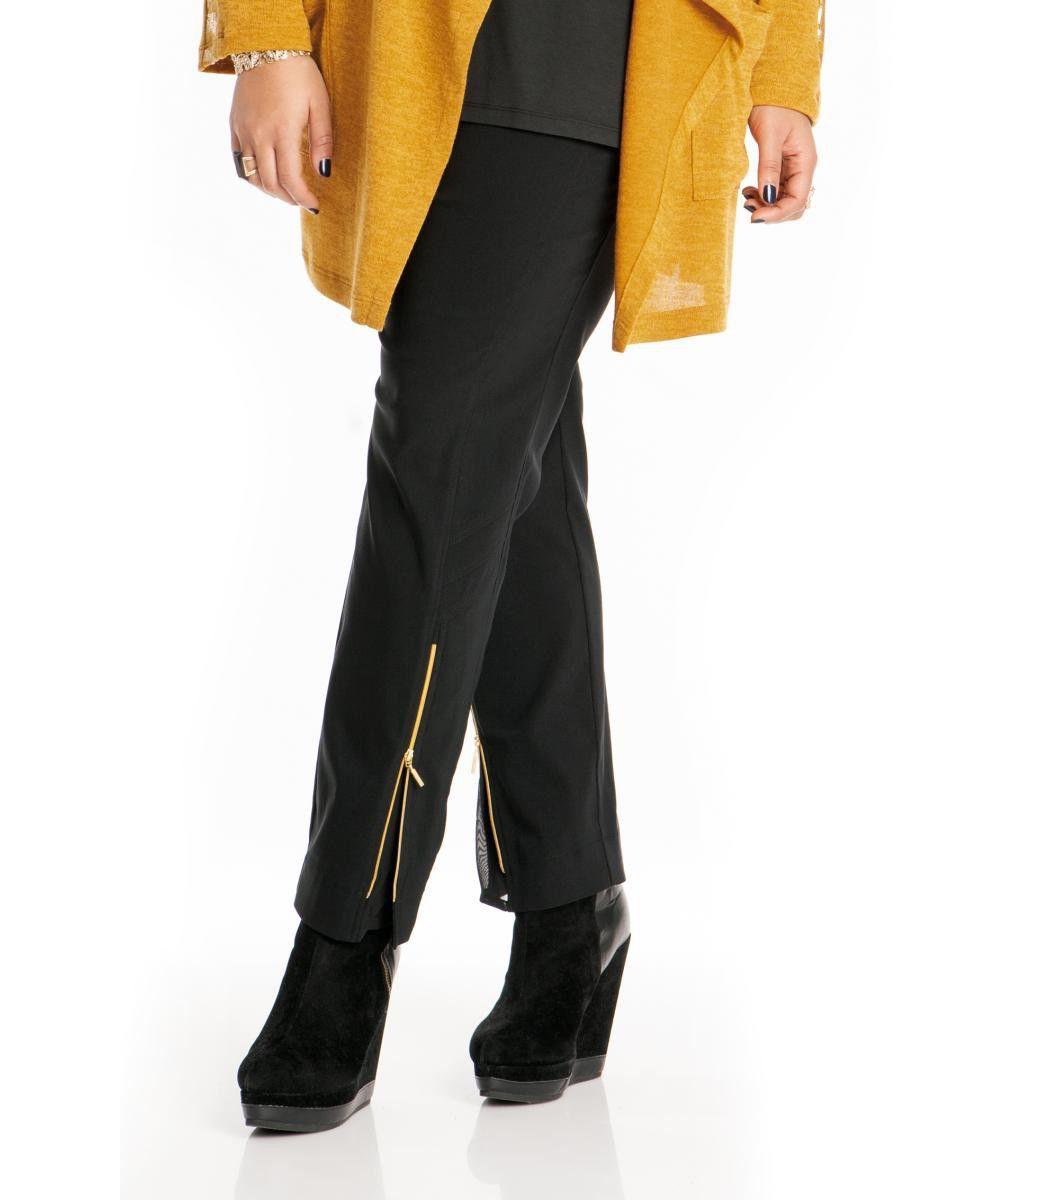 Sempre Piu Damen Hose schwarz   Damenhosen und Jeans   Pinterest 57e341eaac